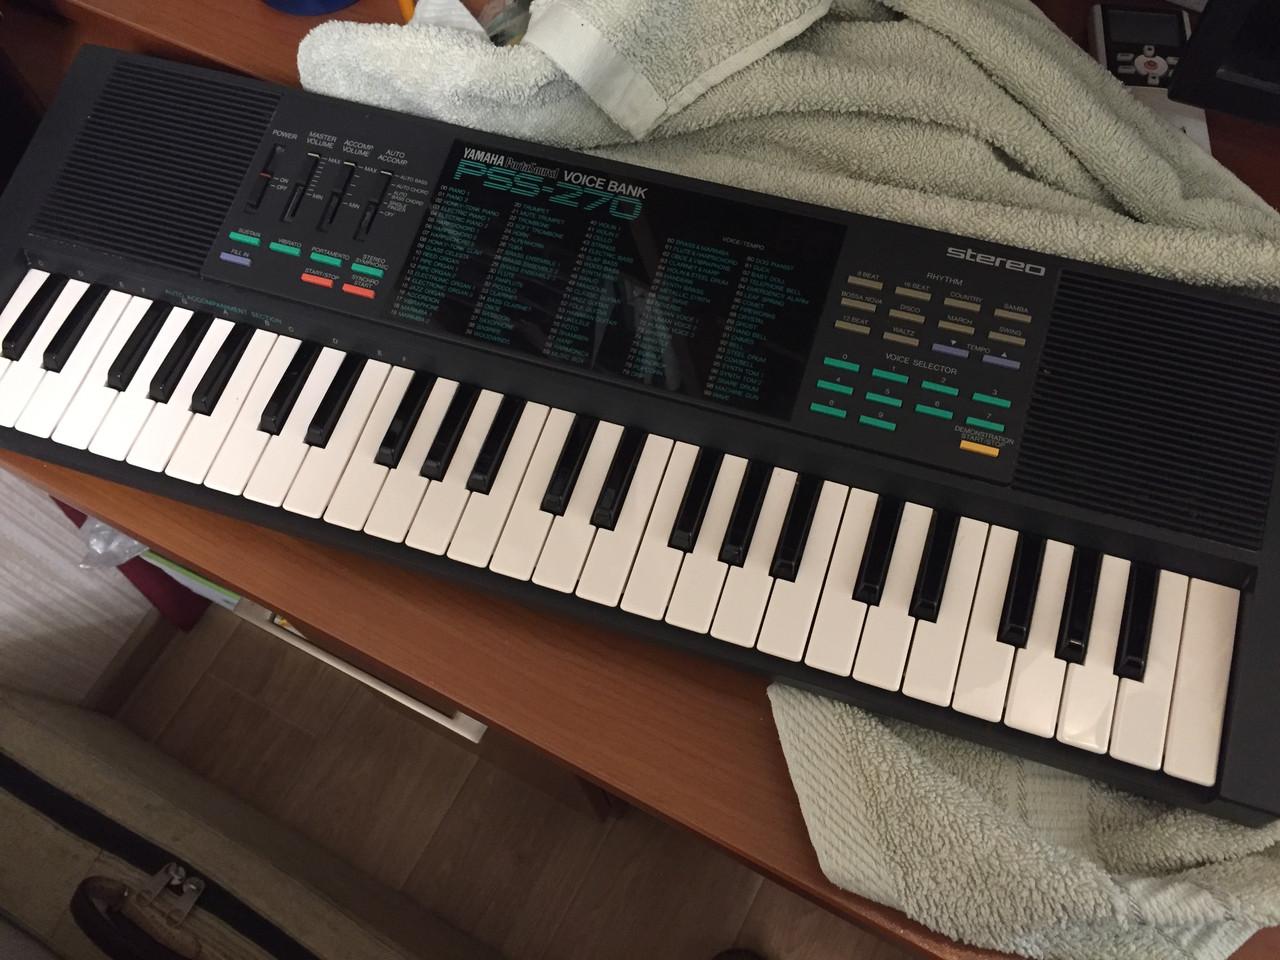 Мини синтезатор, ученический, Yamaha Porta Sound, PSS-270